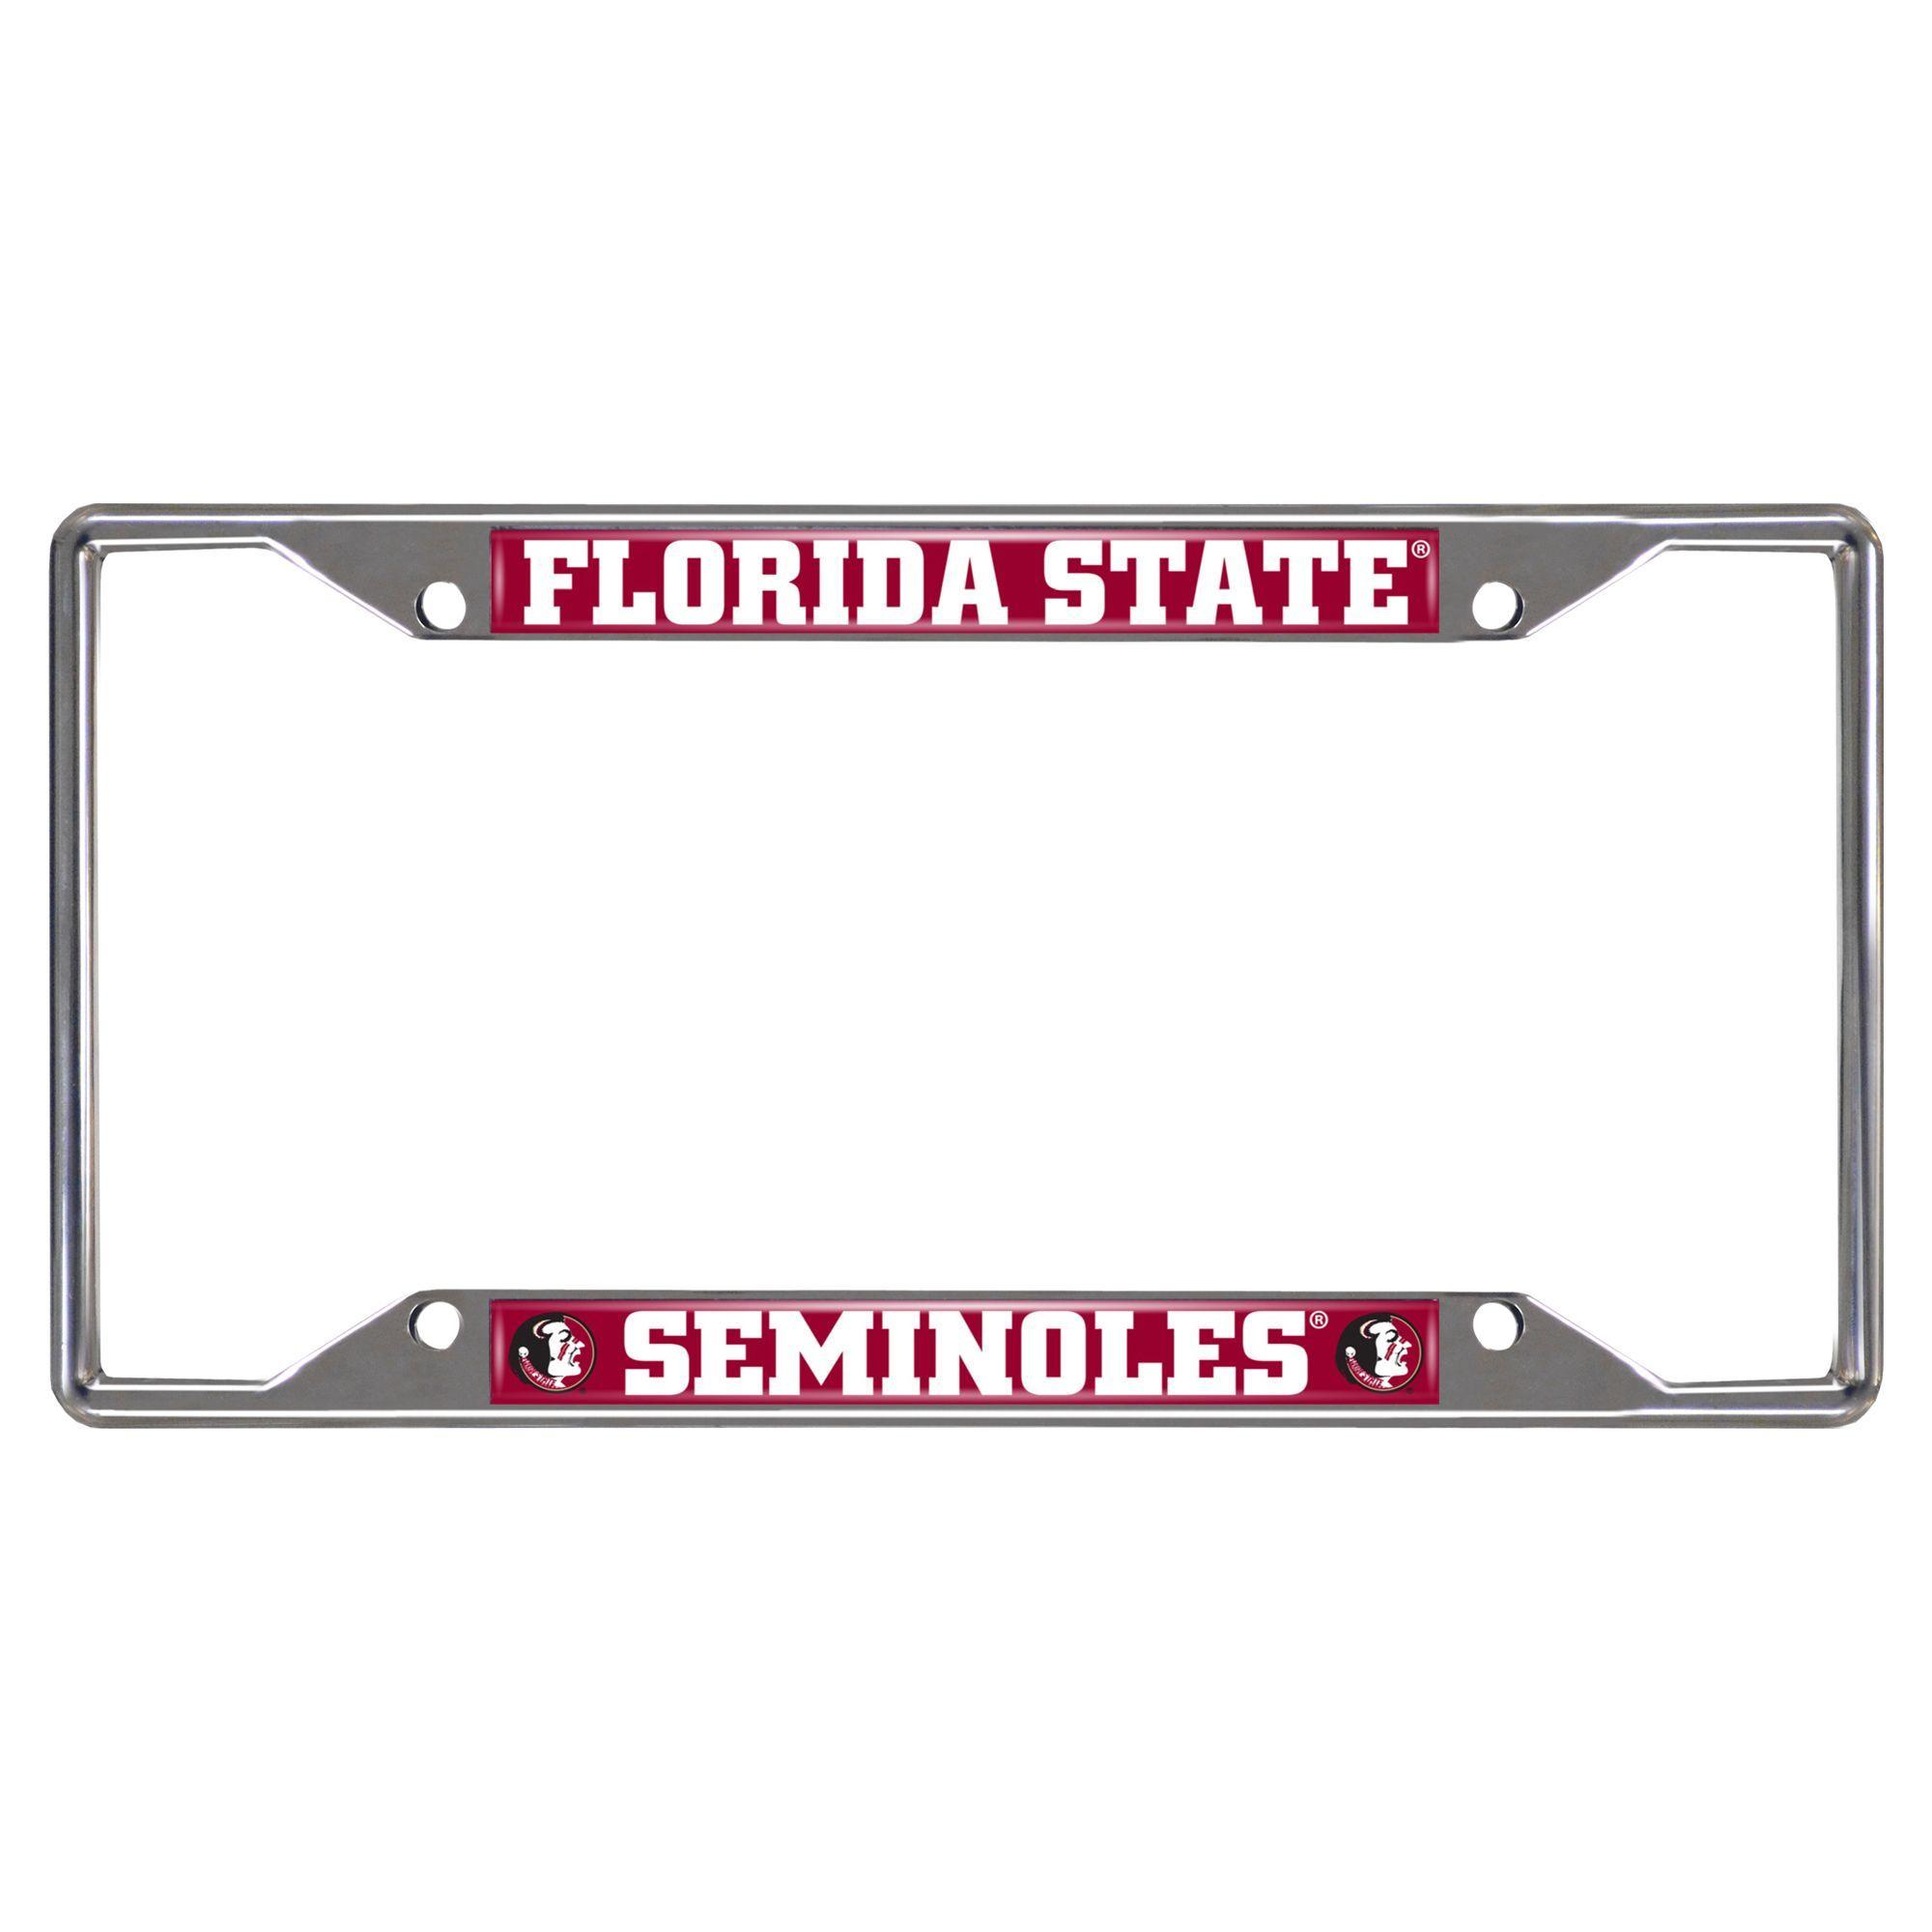 Fanmats Florida State Seminoles Chrome Metal License Plate